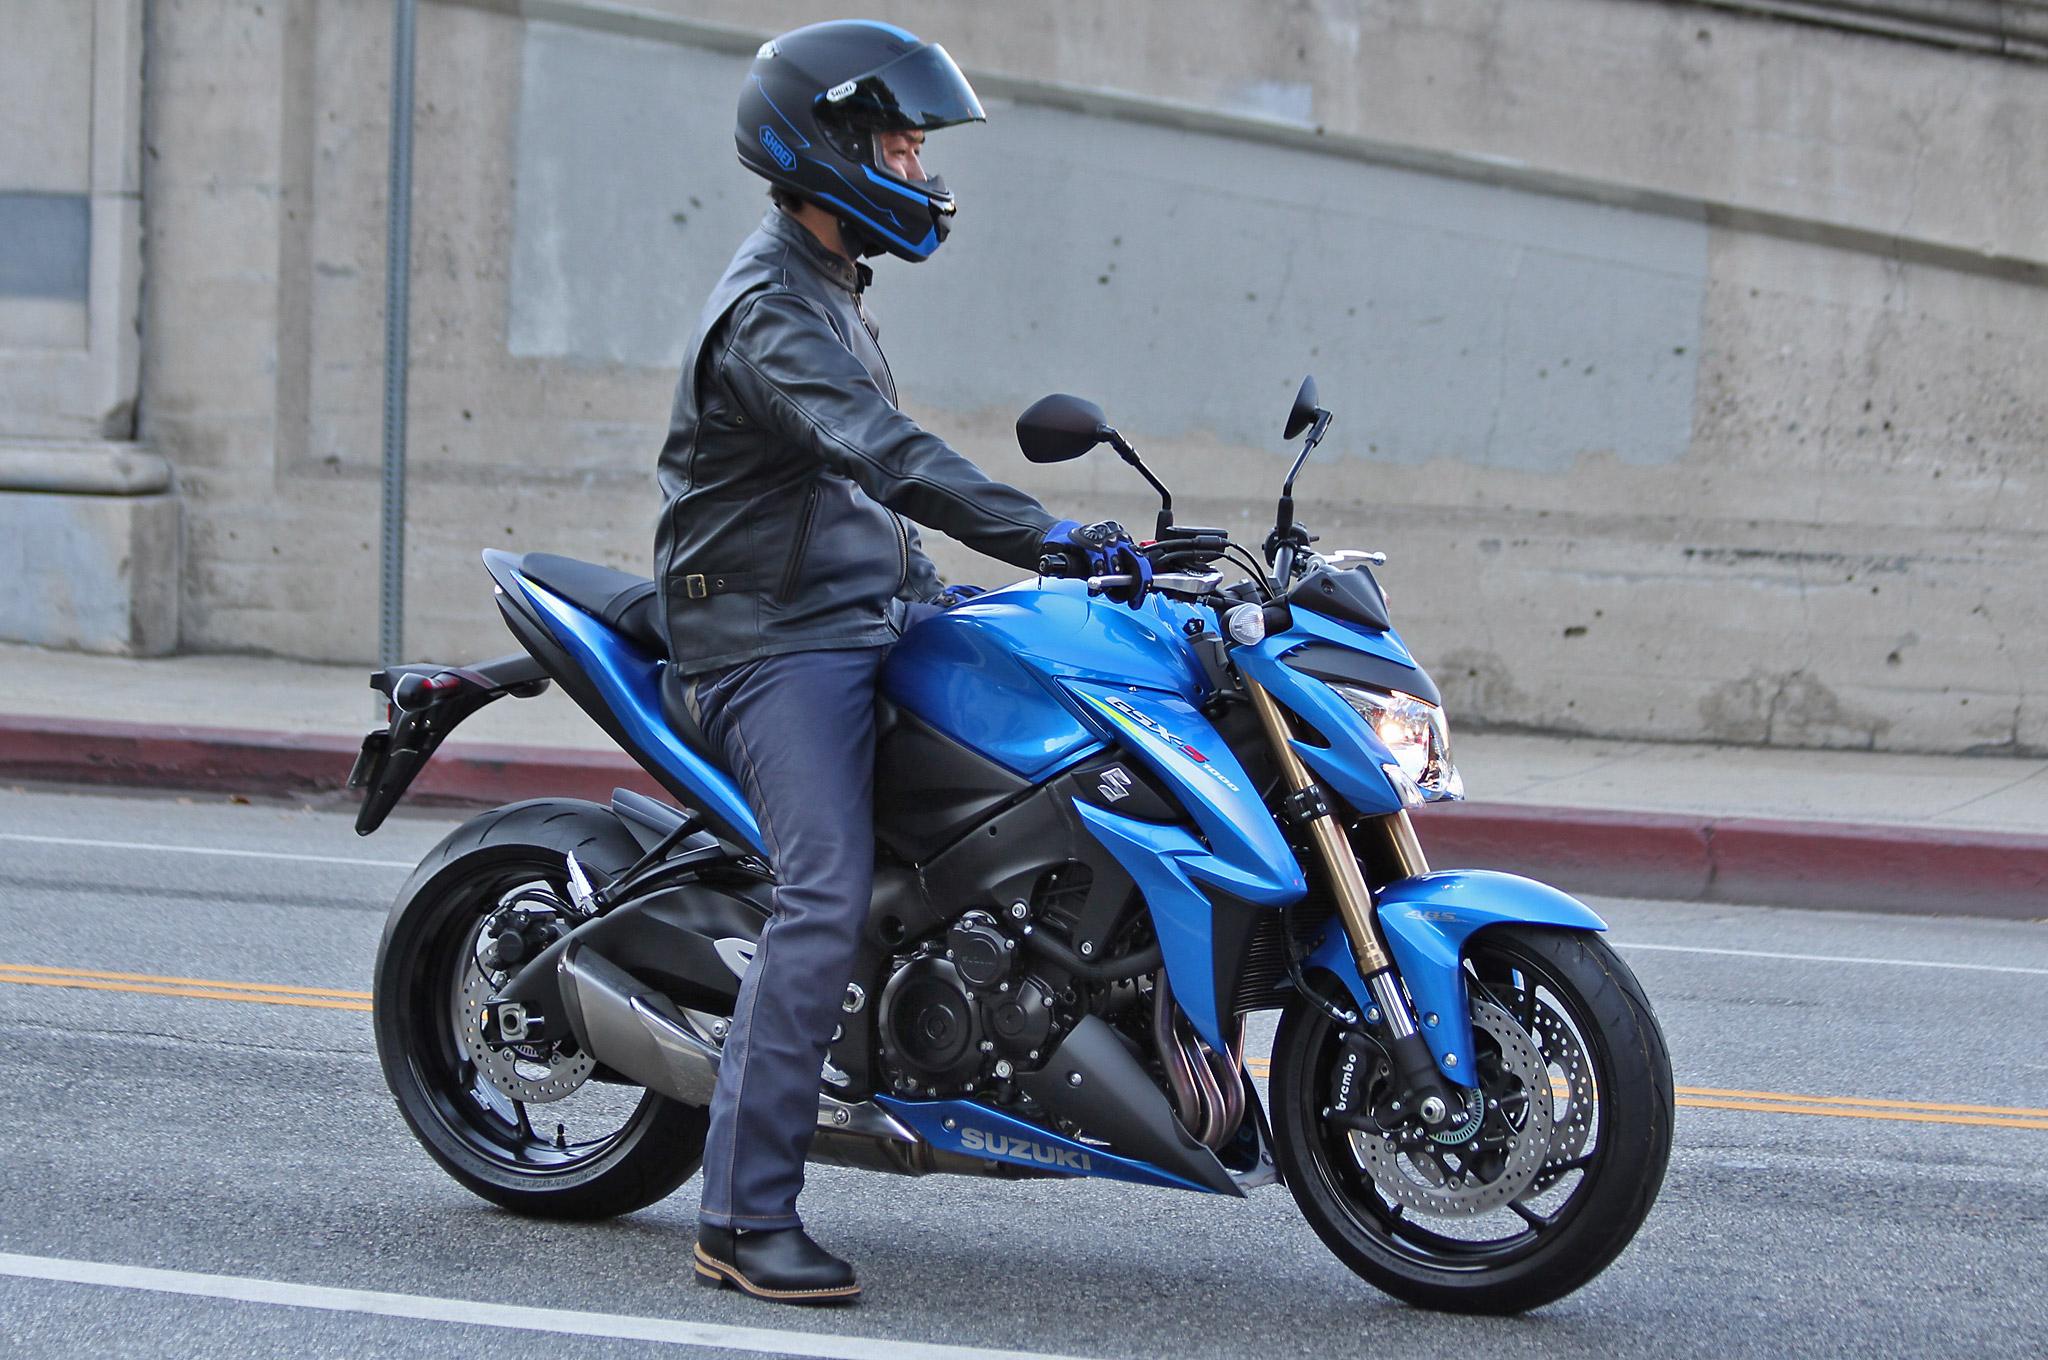 http://s1.cdn.autoevolution.com/images/news/gallery/2015-suzuki-gsx-s1000-high-resolution-pics-show-bike-ready-to-roll-photo-gallery_1.jpg